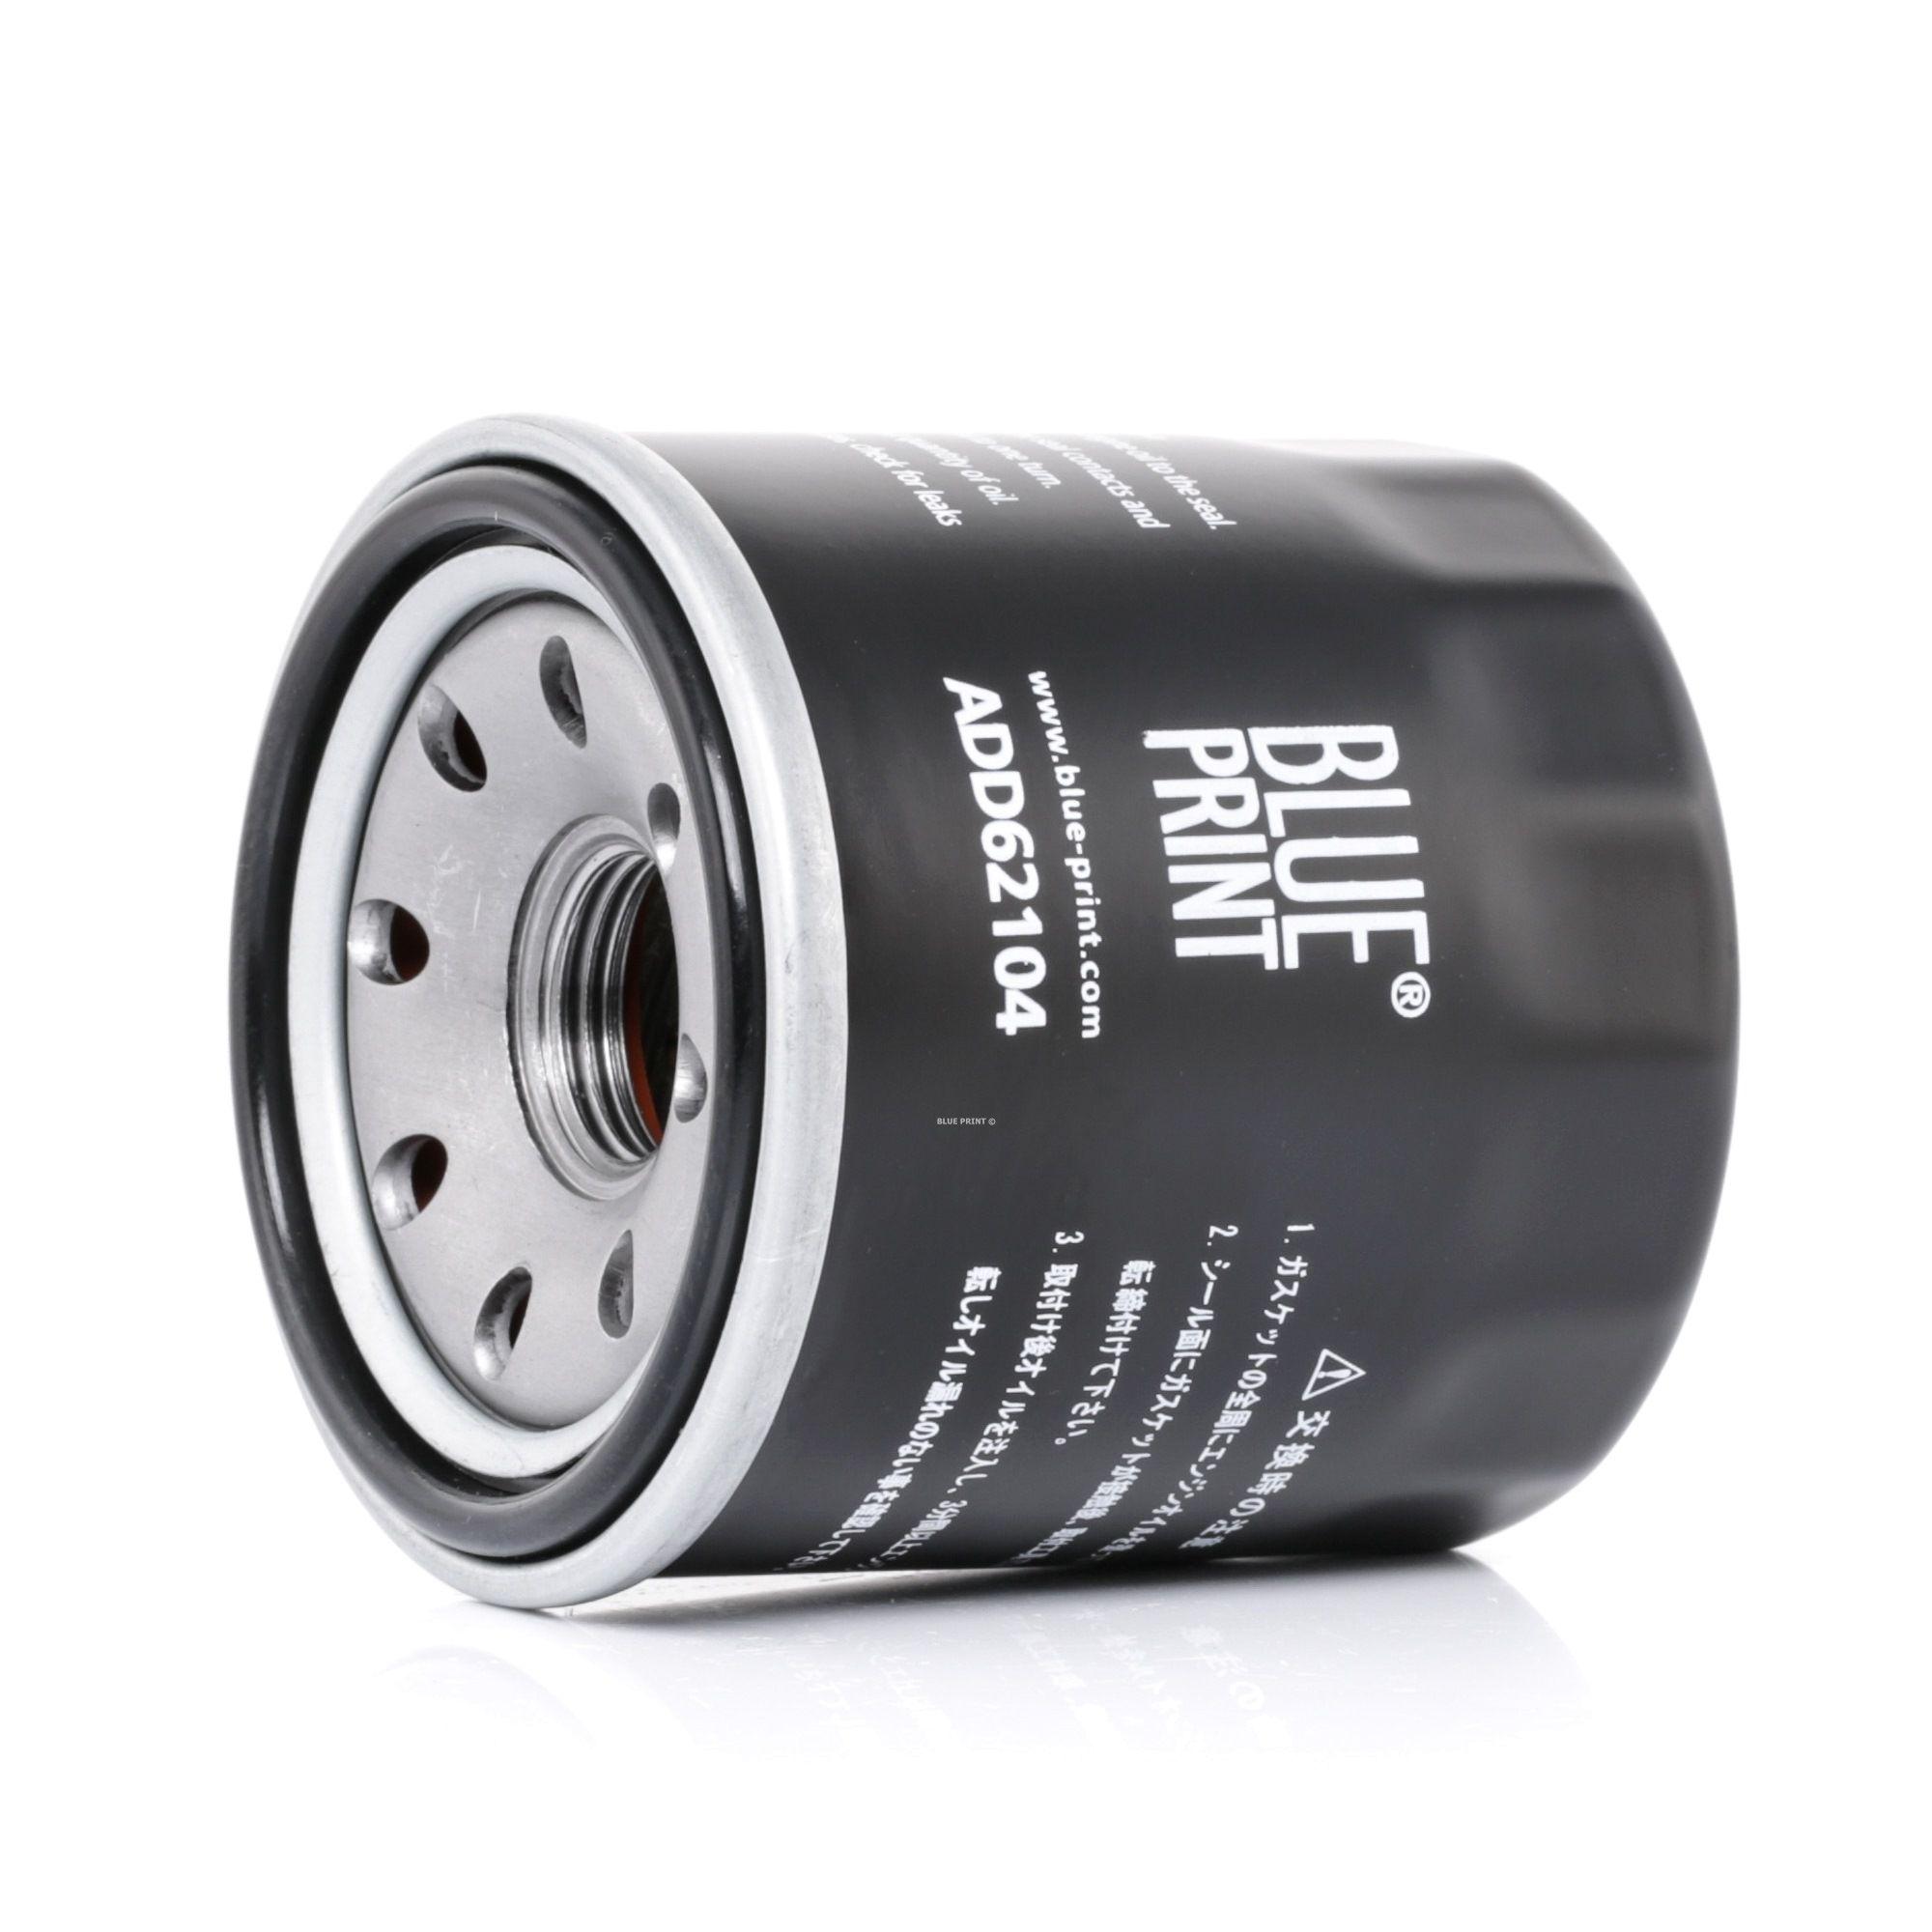 Origine Filtre à huile BLUE PRINT ADD62104 (Ø: 69,5mm, Hauteur: 65mm)